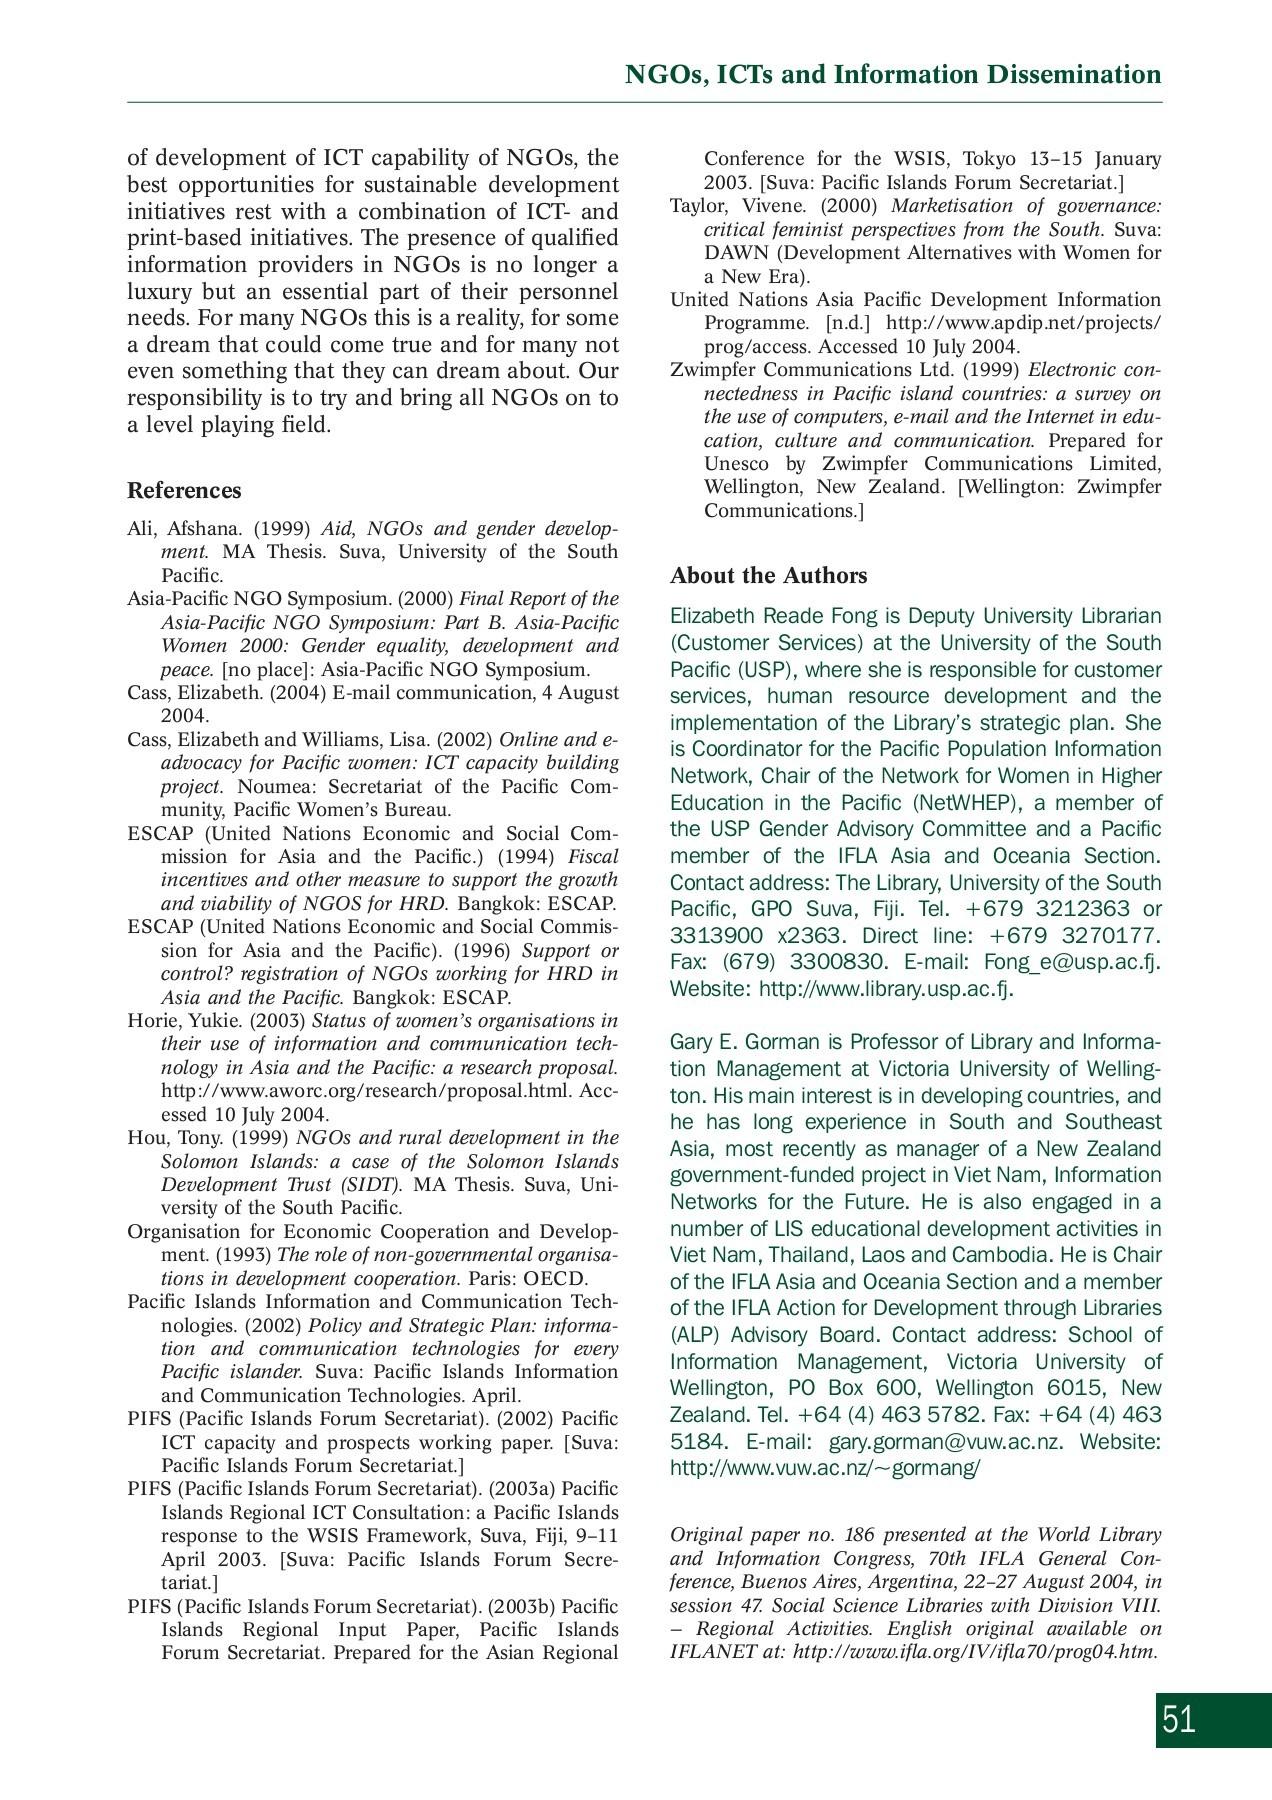 Jardin Colombie Élégant Journal Of ifla Volume 31 2005 Of 80 Élégant Jardin Colombie